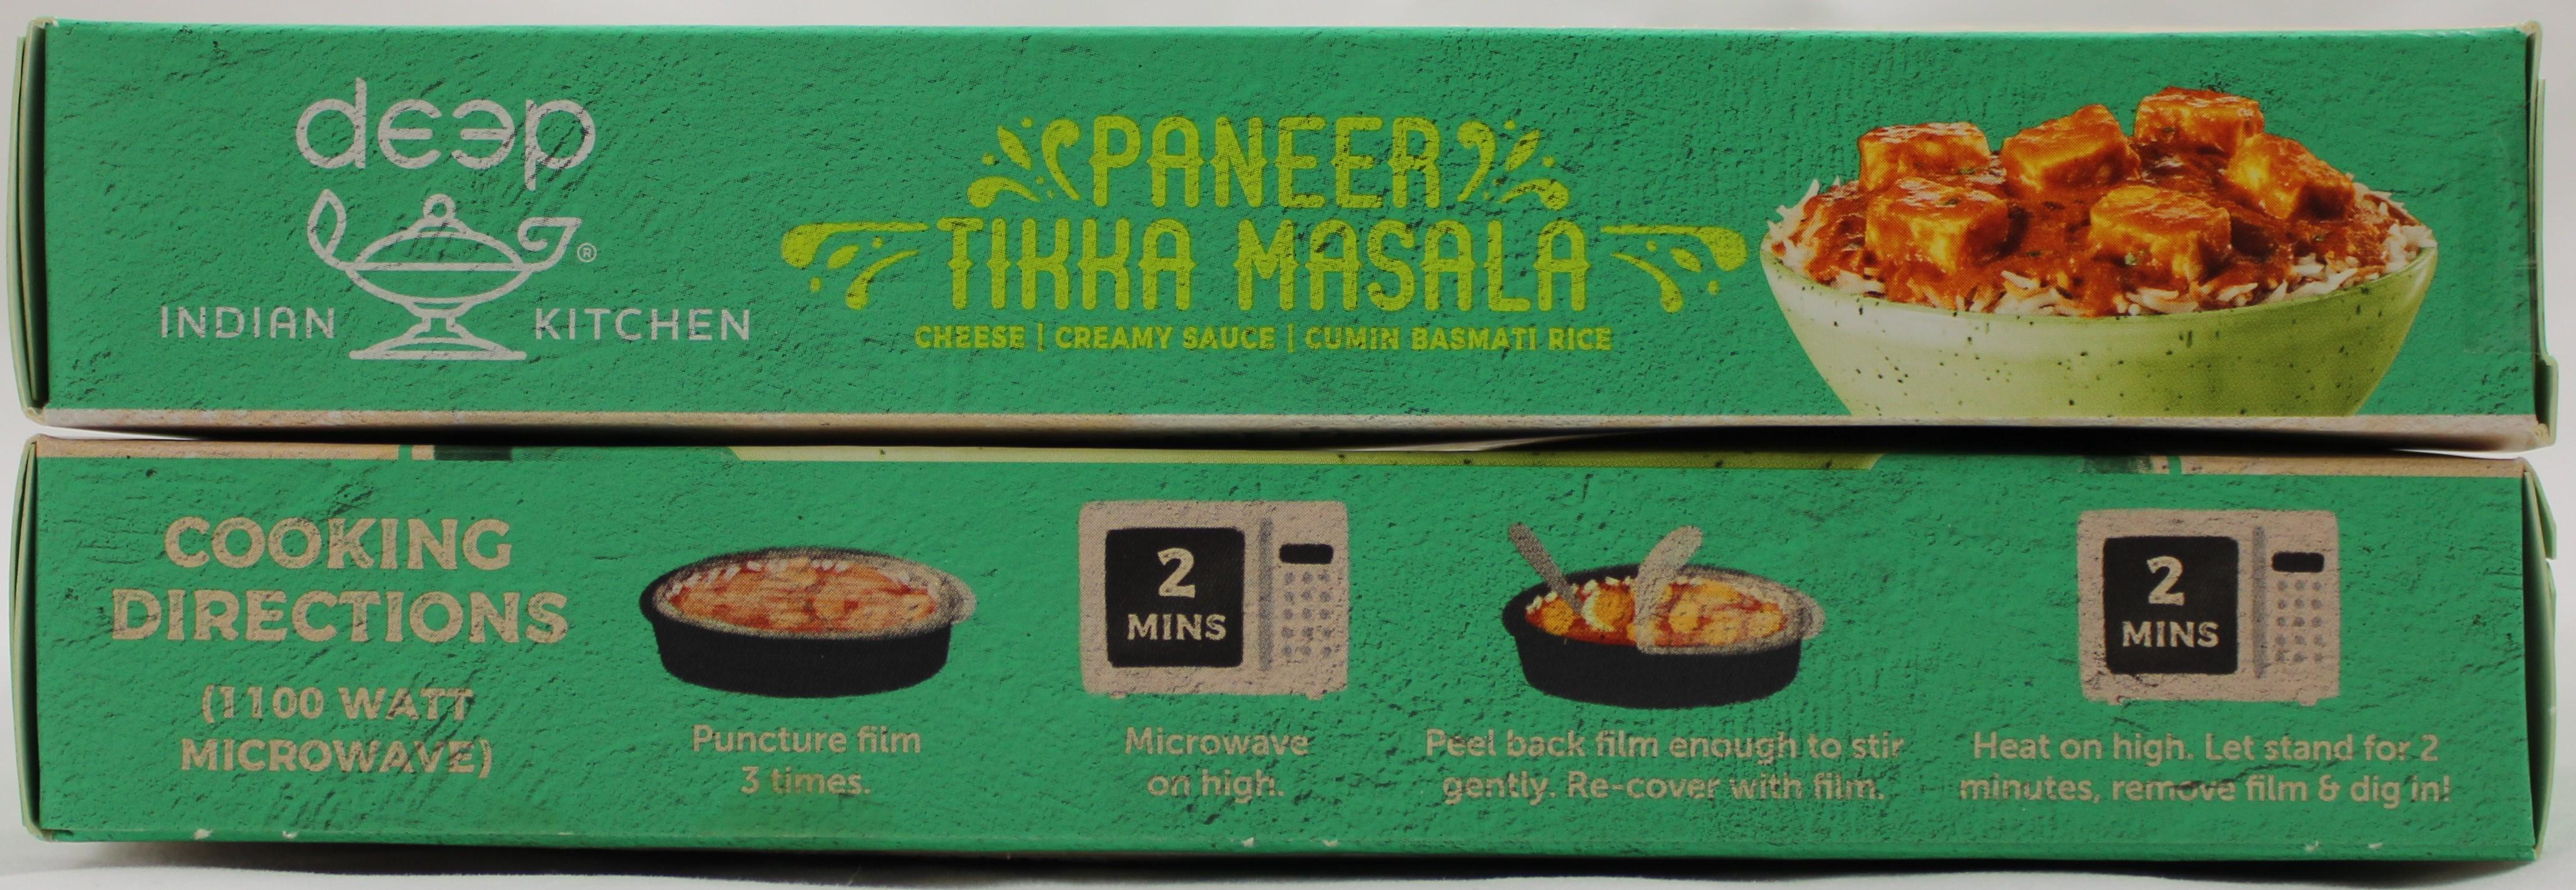 Paneer Tika Masala w/ Rice 9oz.